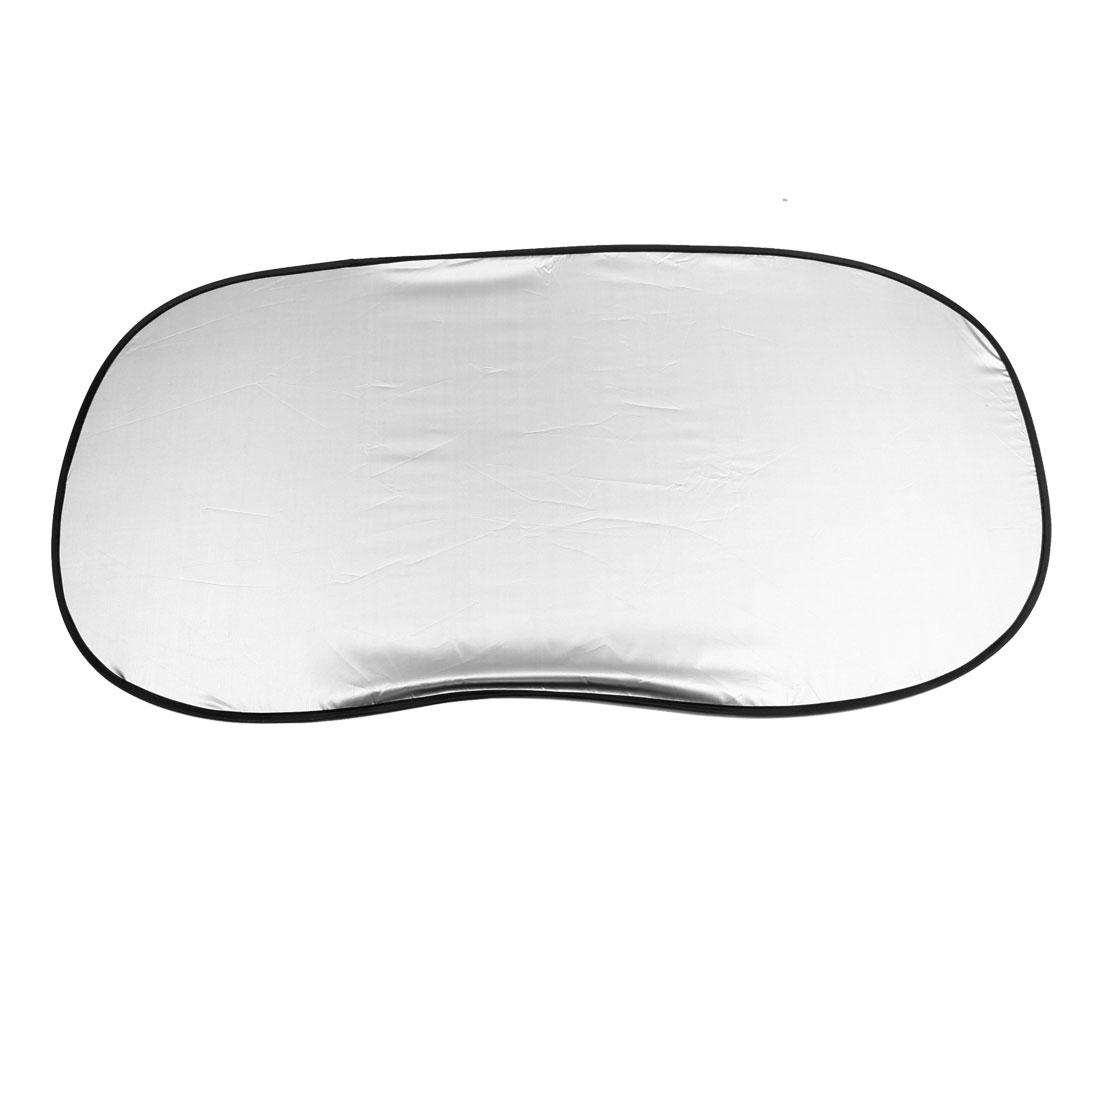 100cm x 50cm Silver Gray Polyester Rear Window Sun Shade for Car Automobile